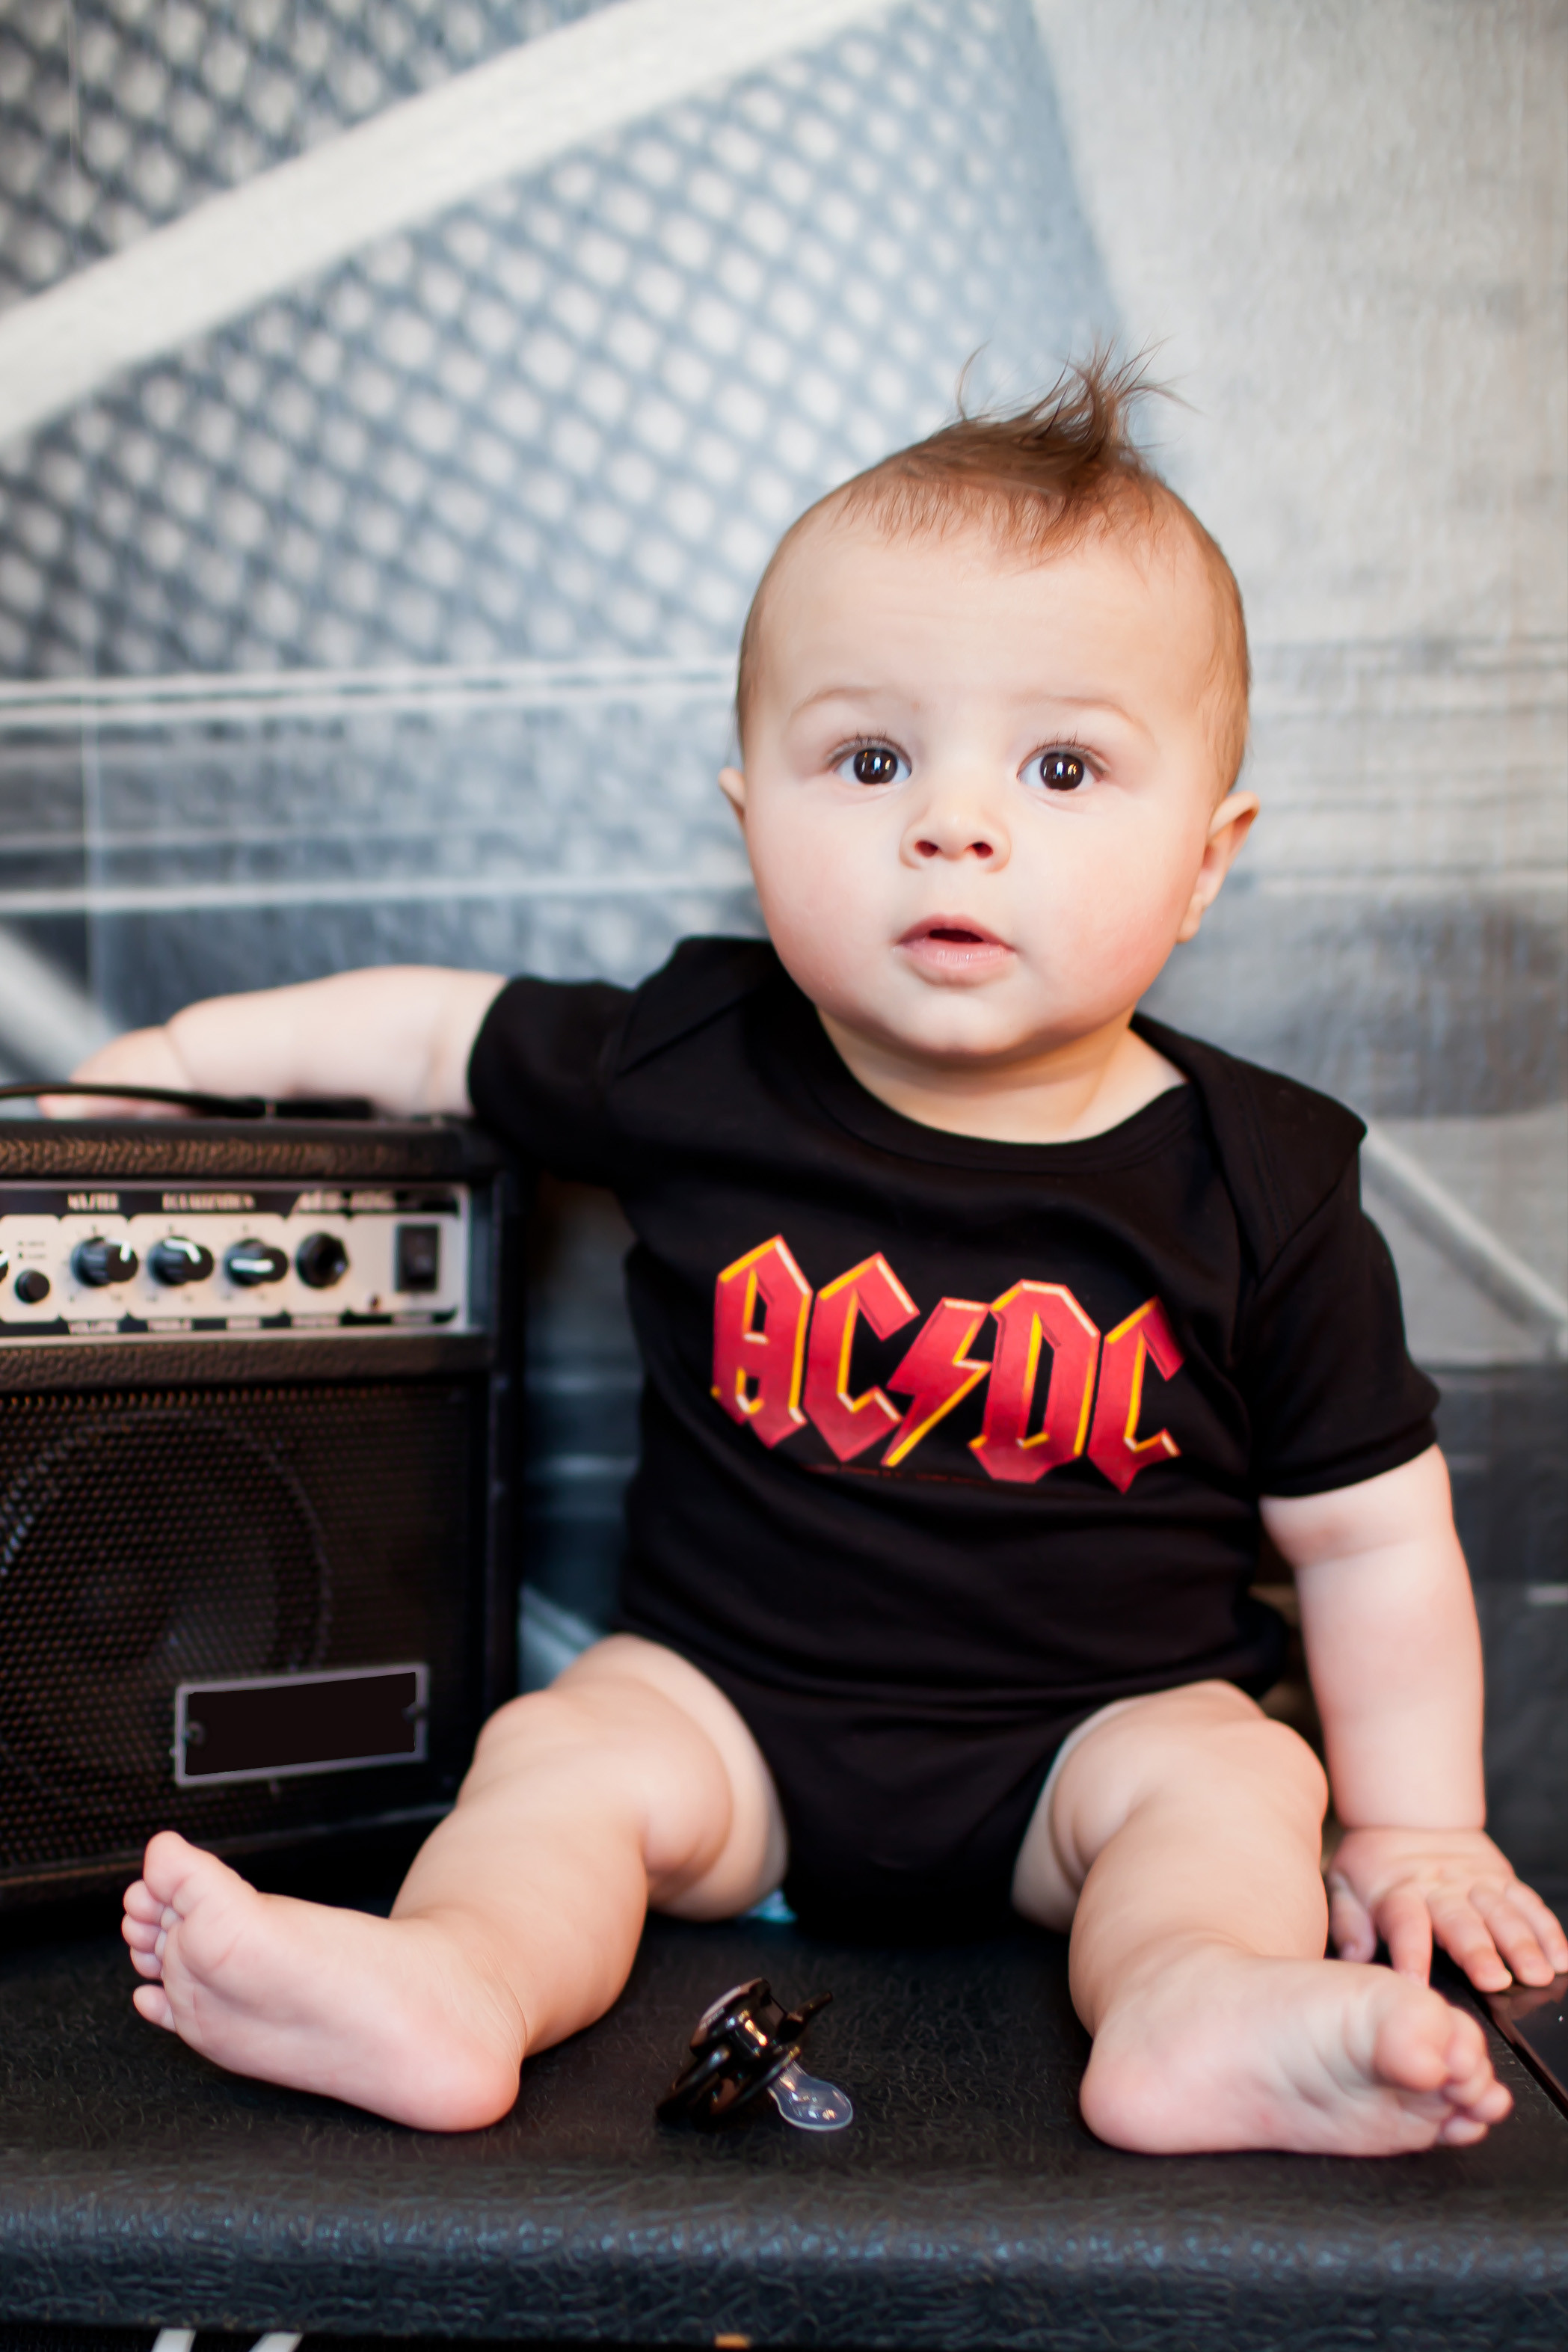 AC/DC Baby Onesie sitting on guitar amp